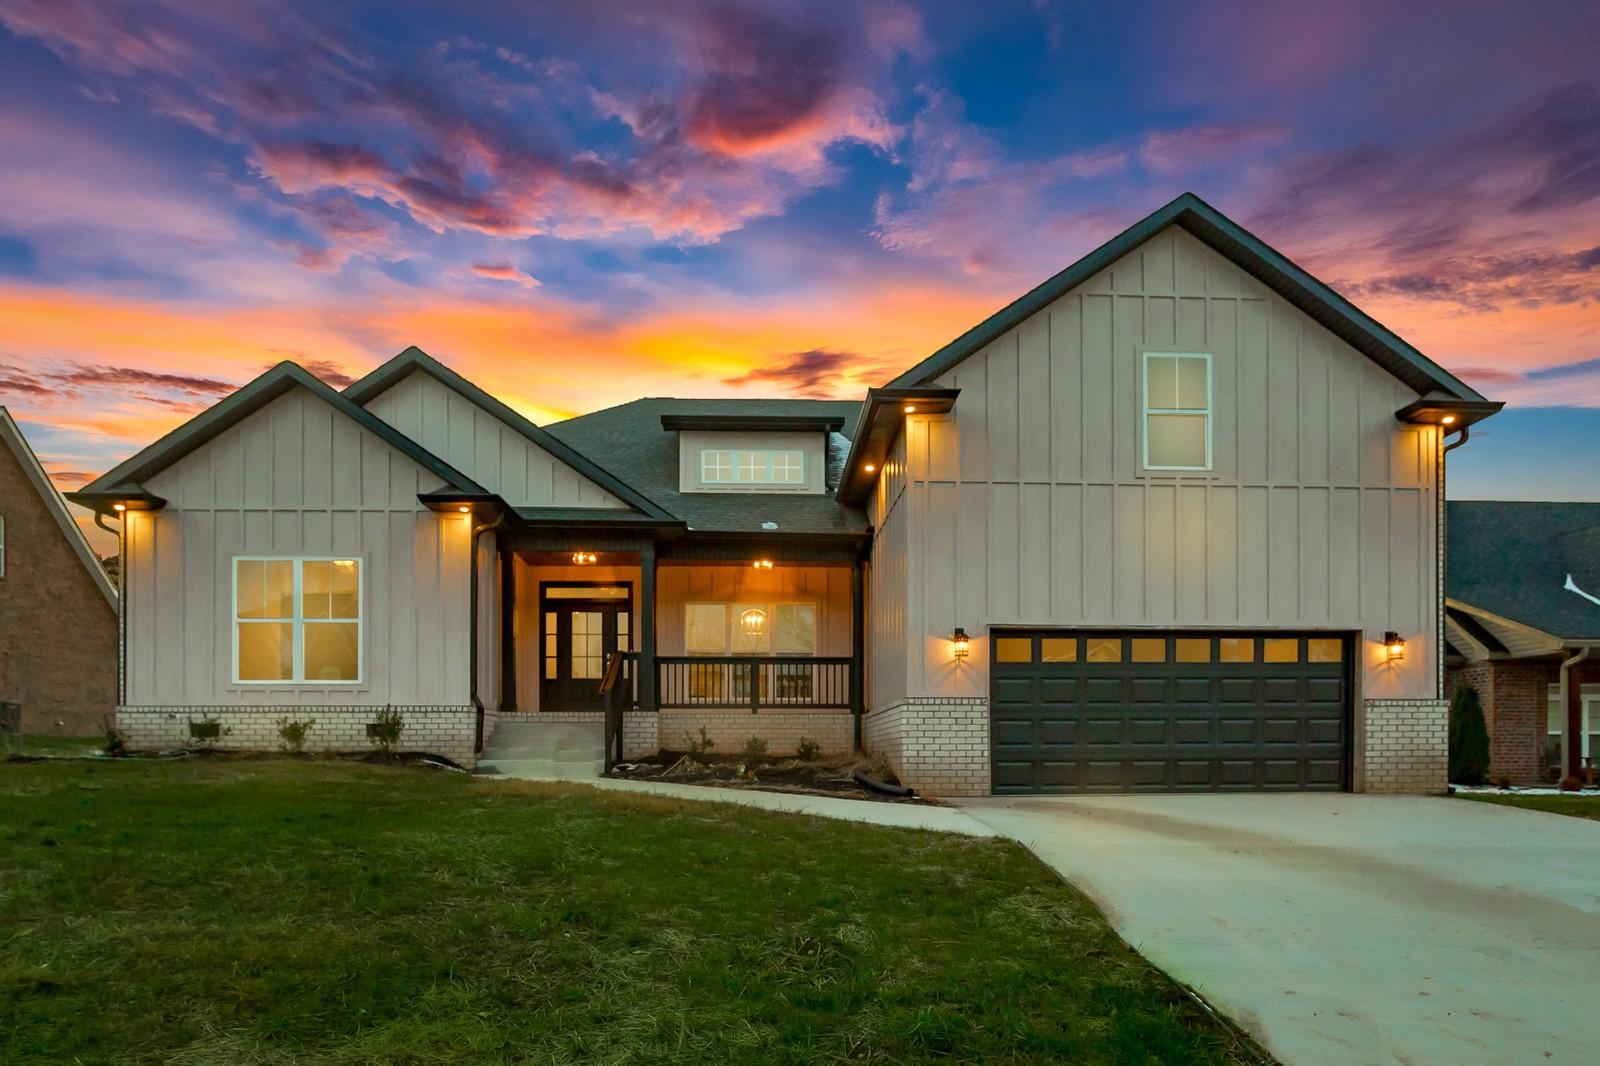 4383 Memory Ln, Adams, TN 37010 - Adams, TN real estate listing